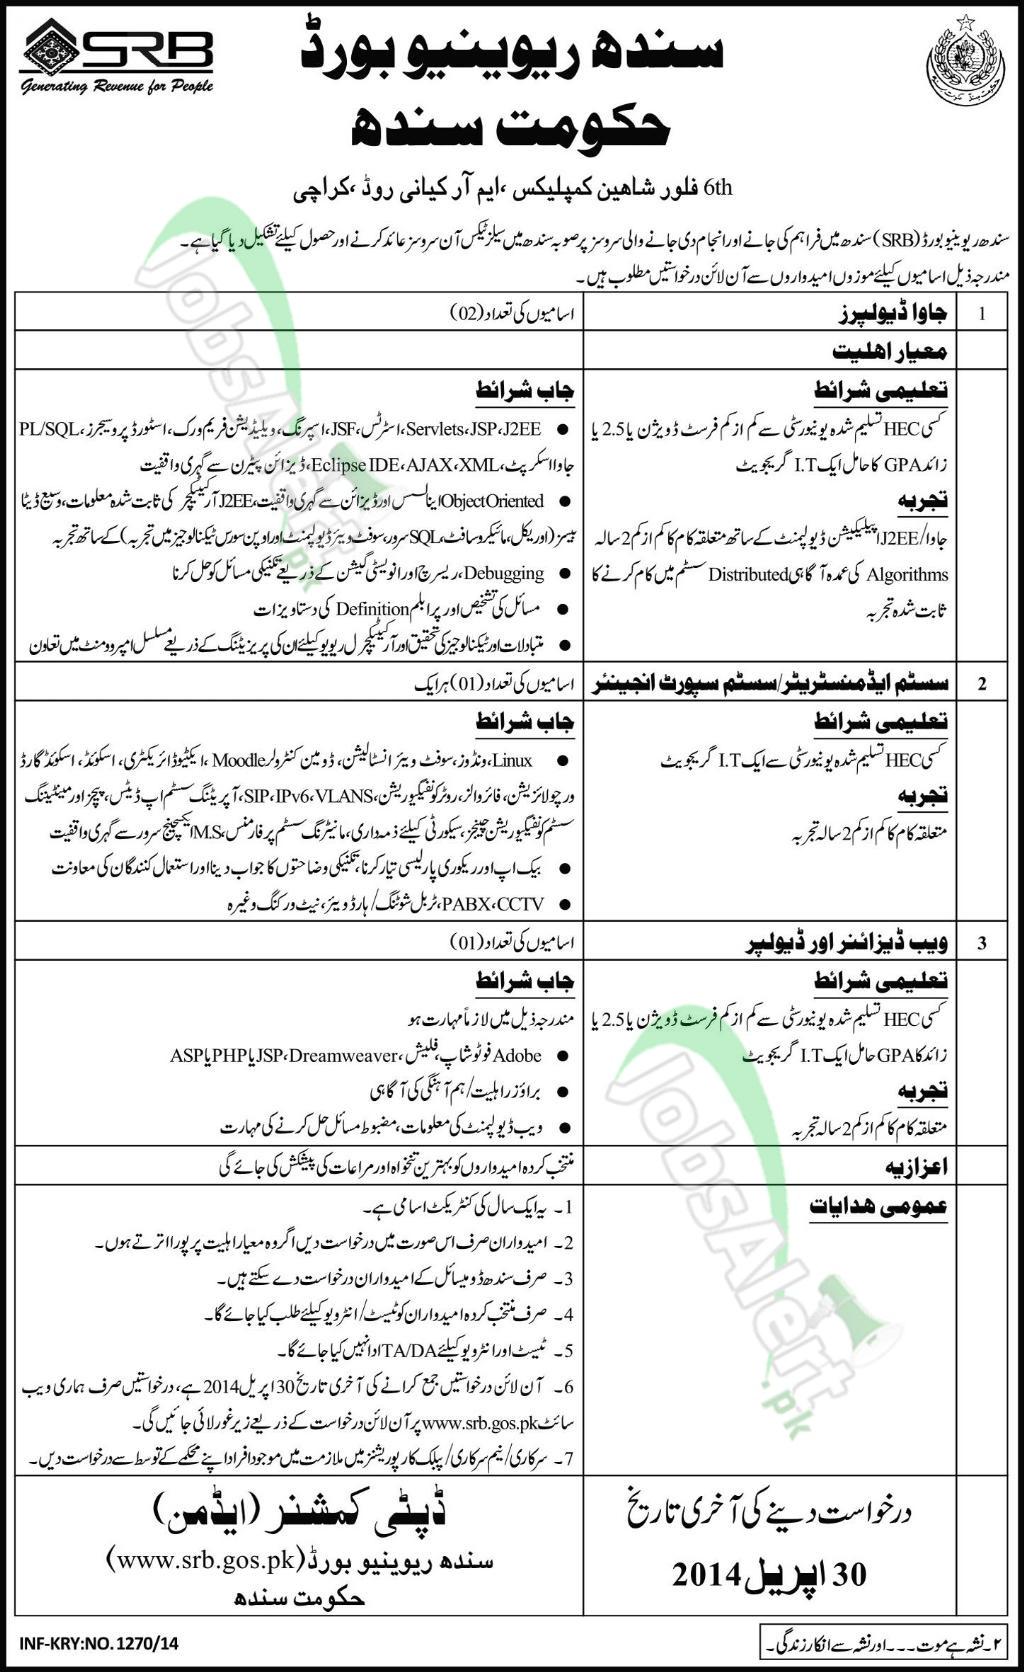 Sindh Revenue Board (SRB) Karachi